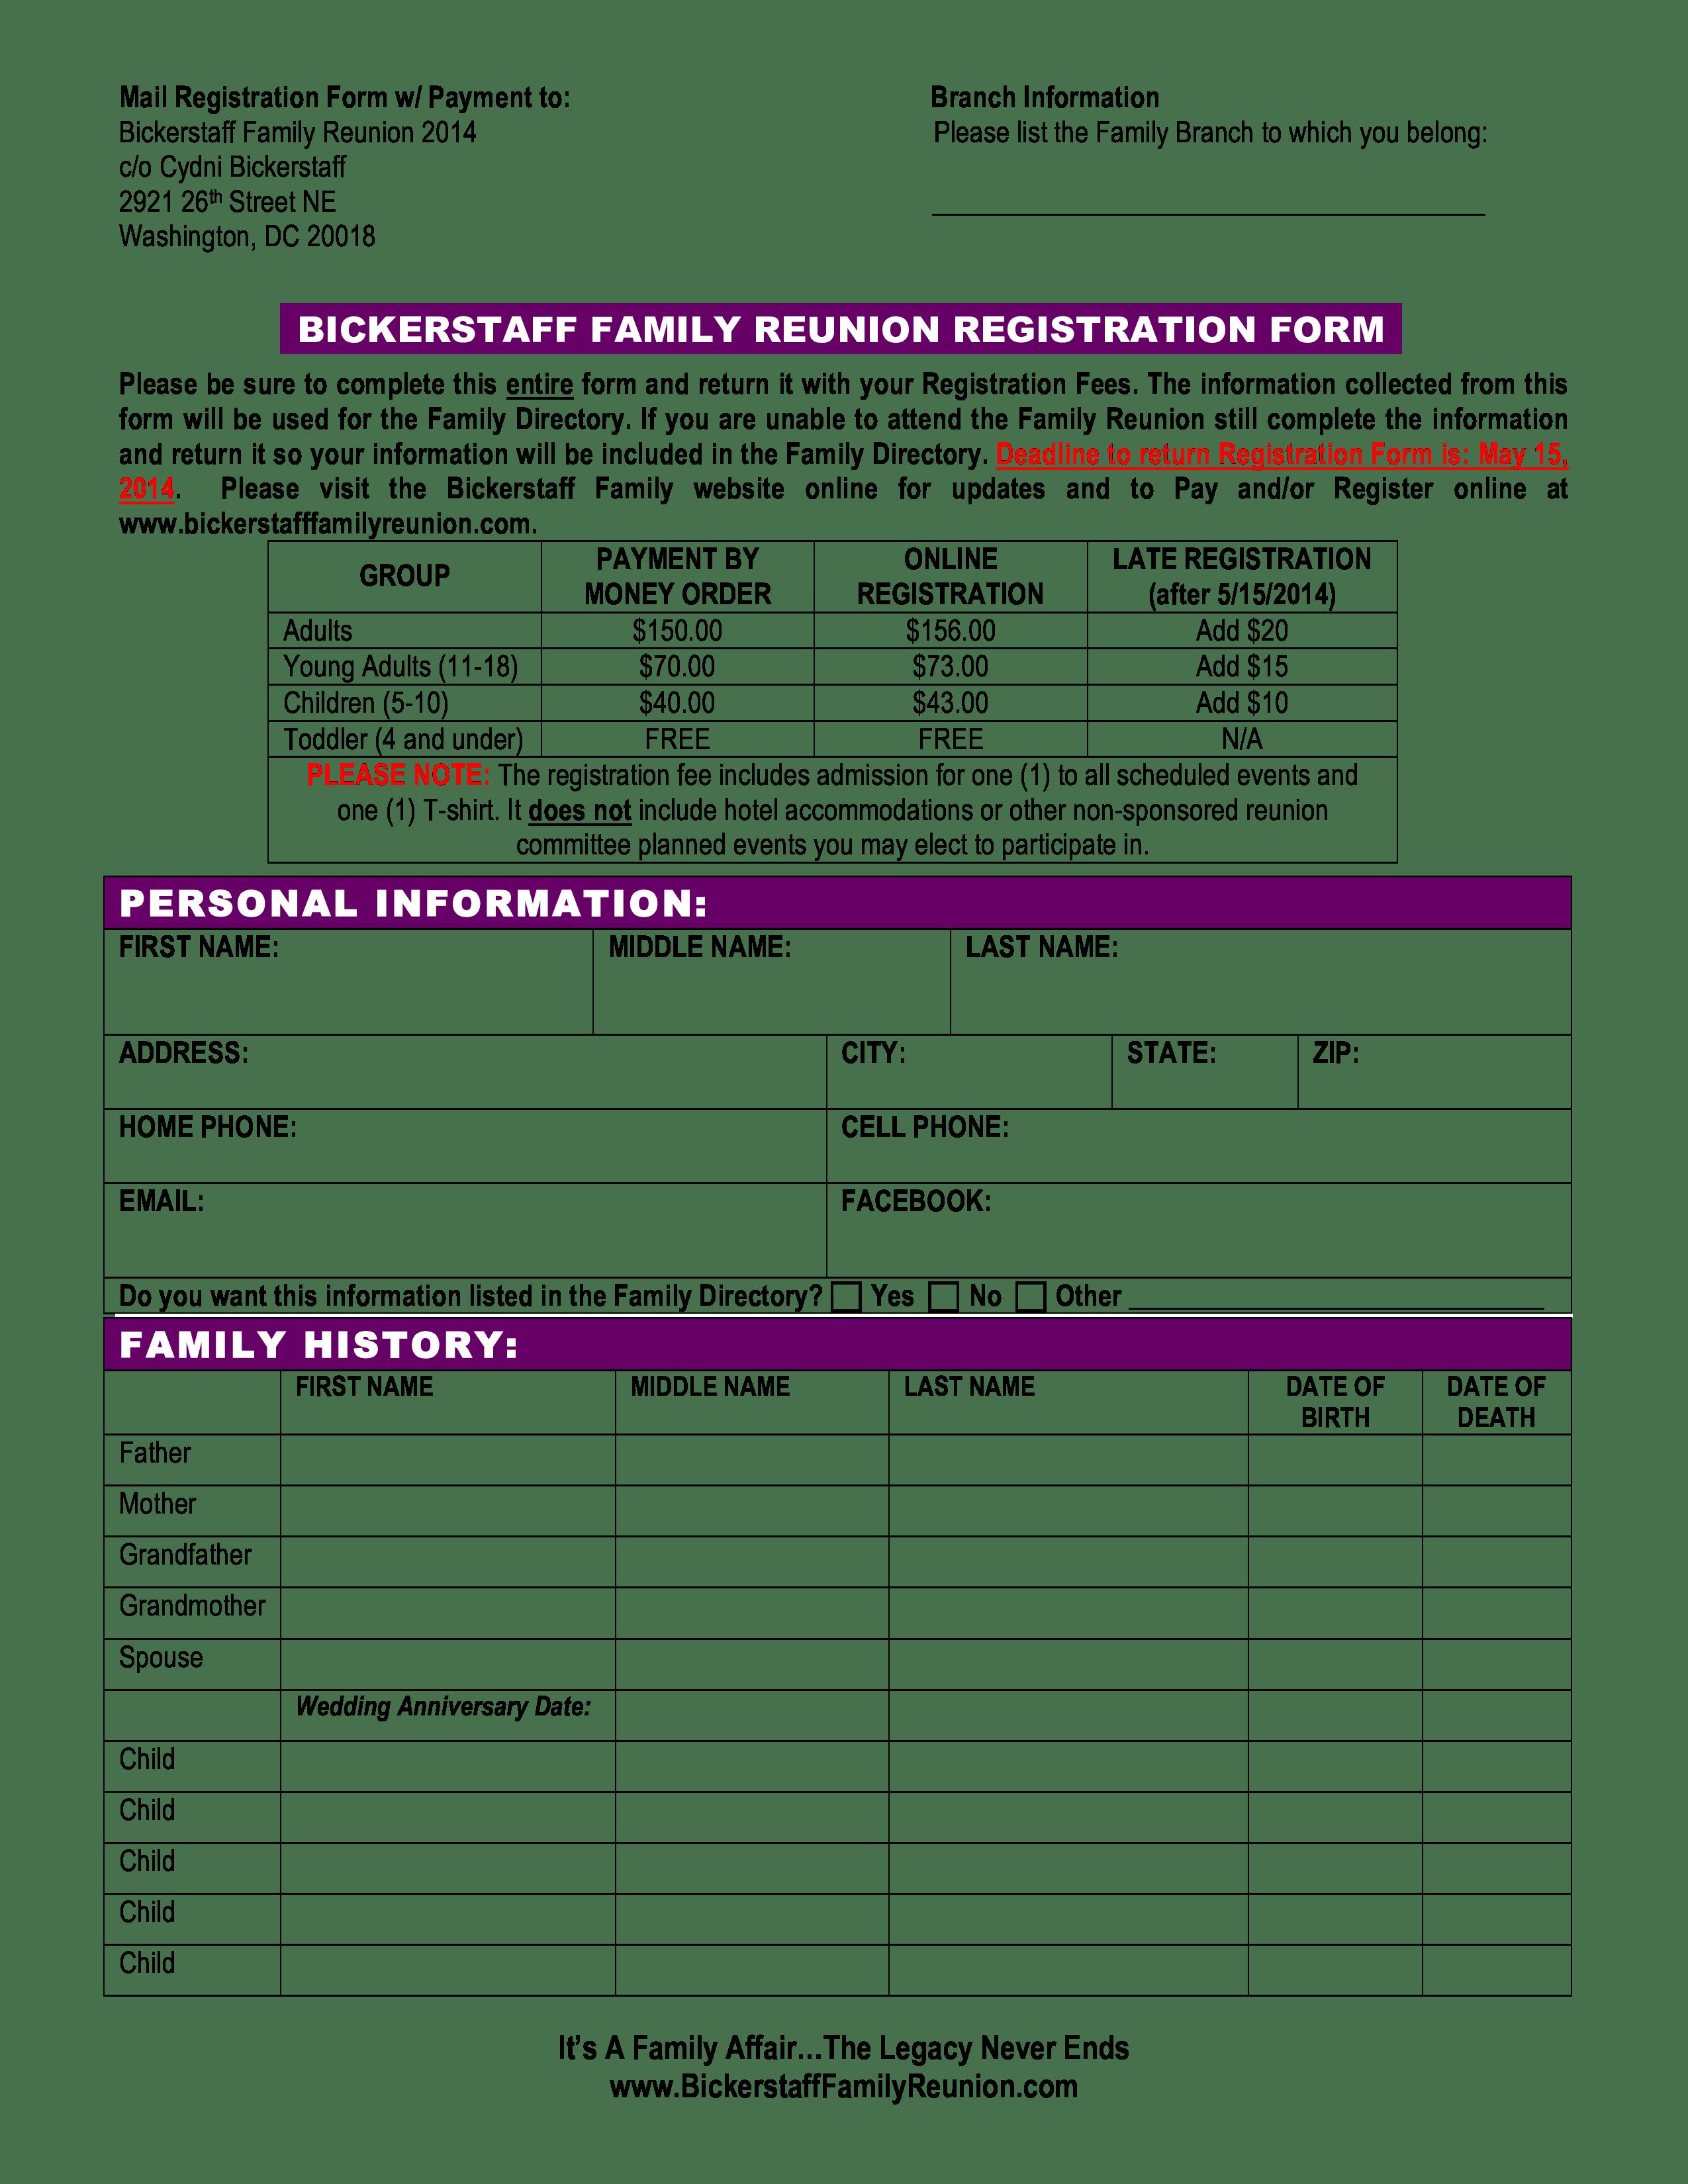 Family Reunion Registration Form   Templates at allbusinesstemplates.com